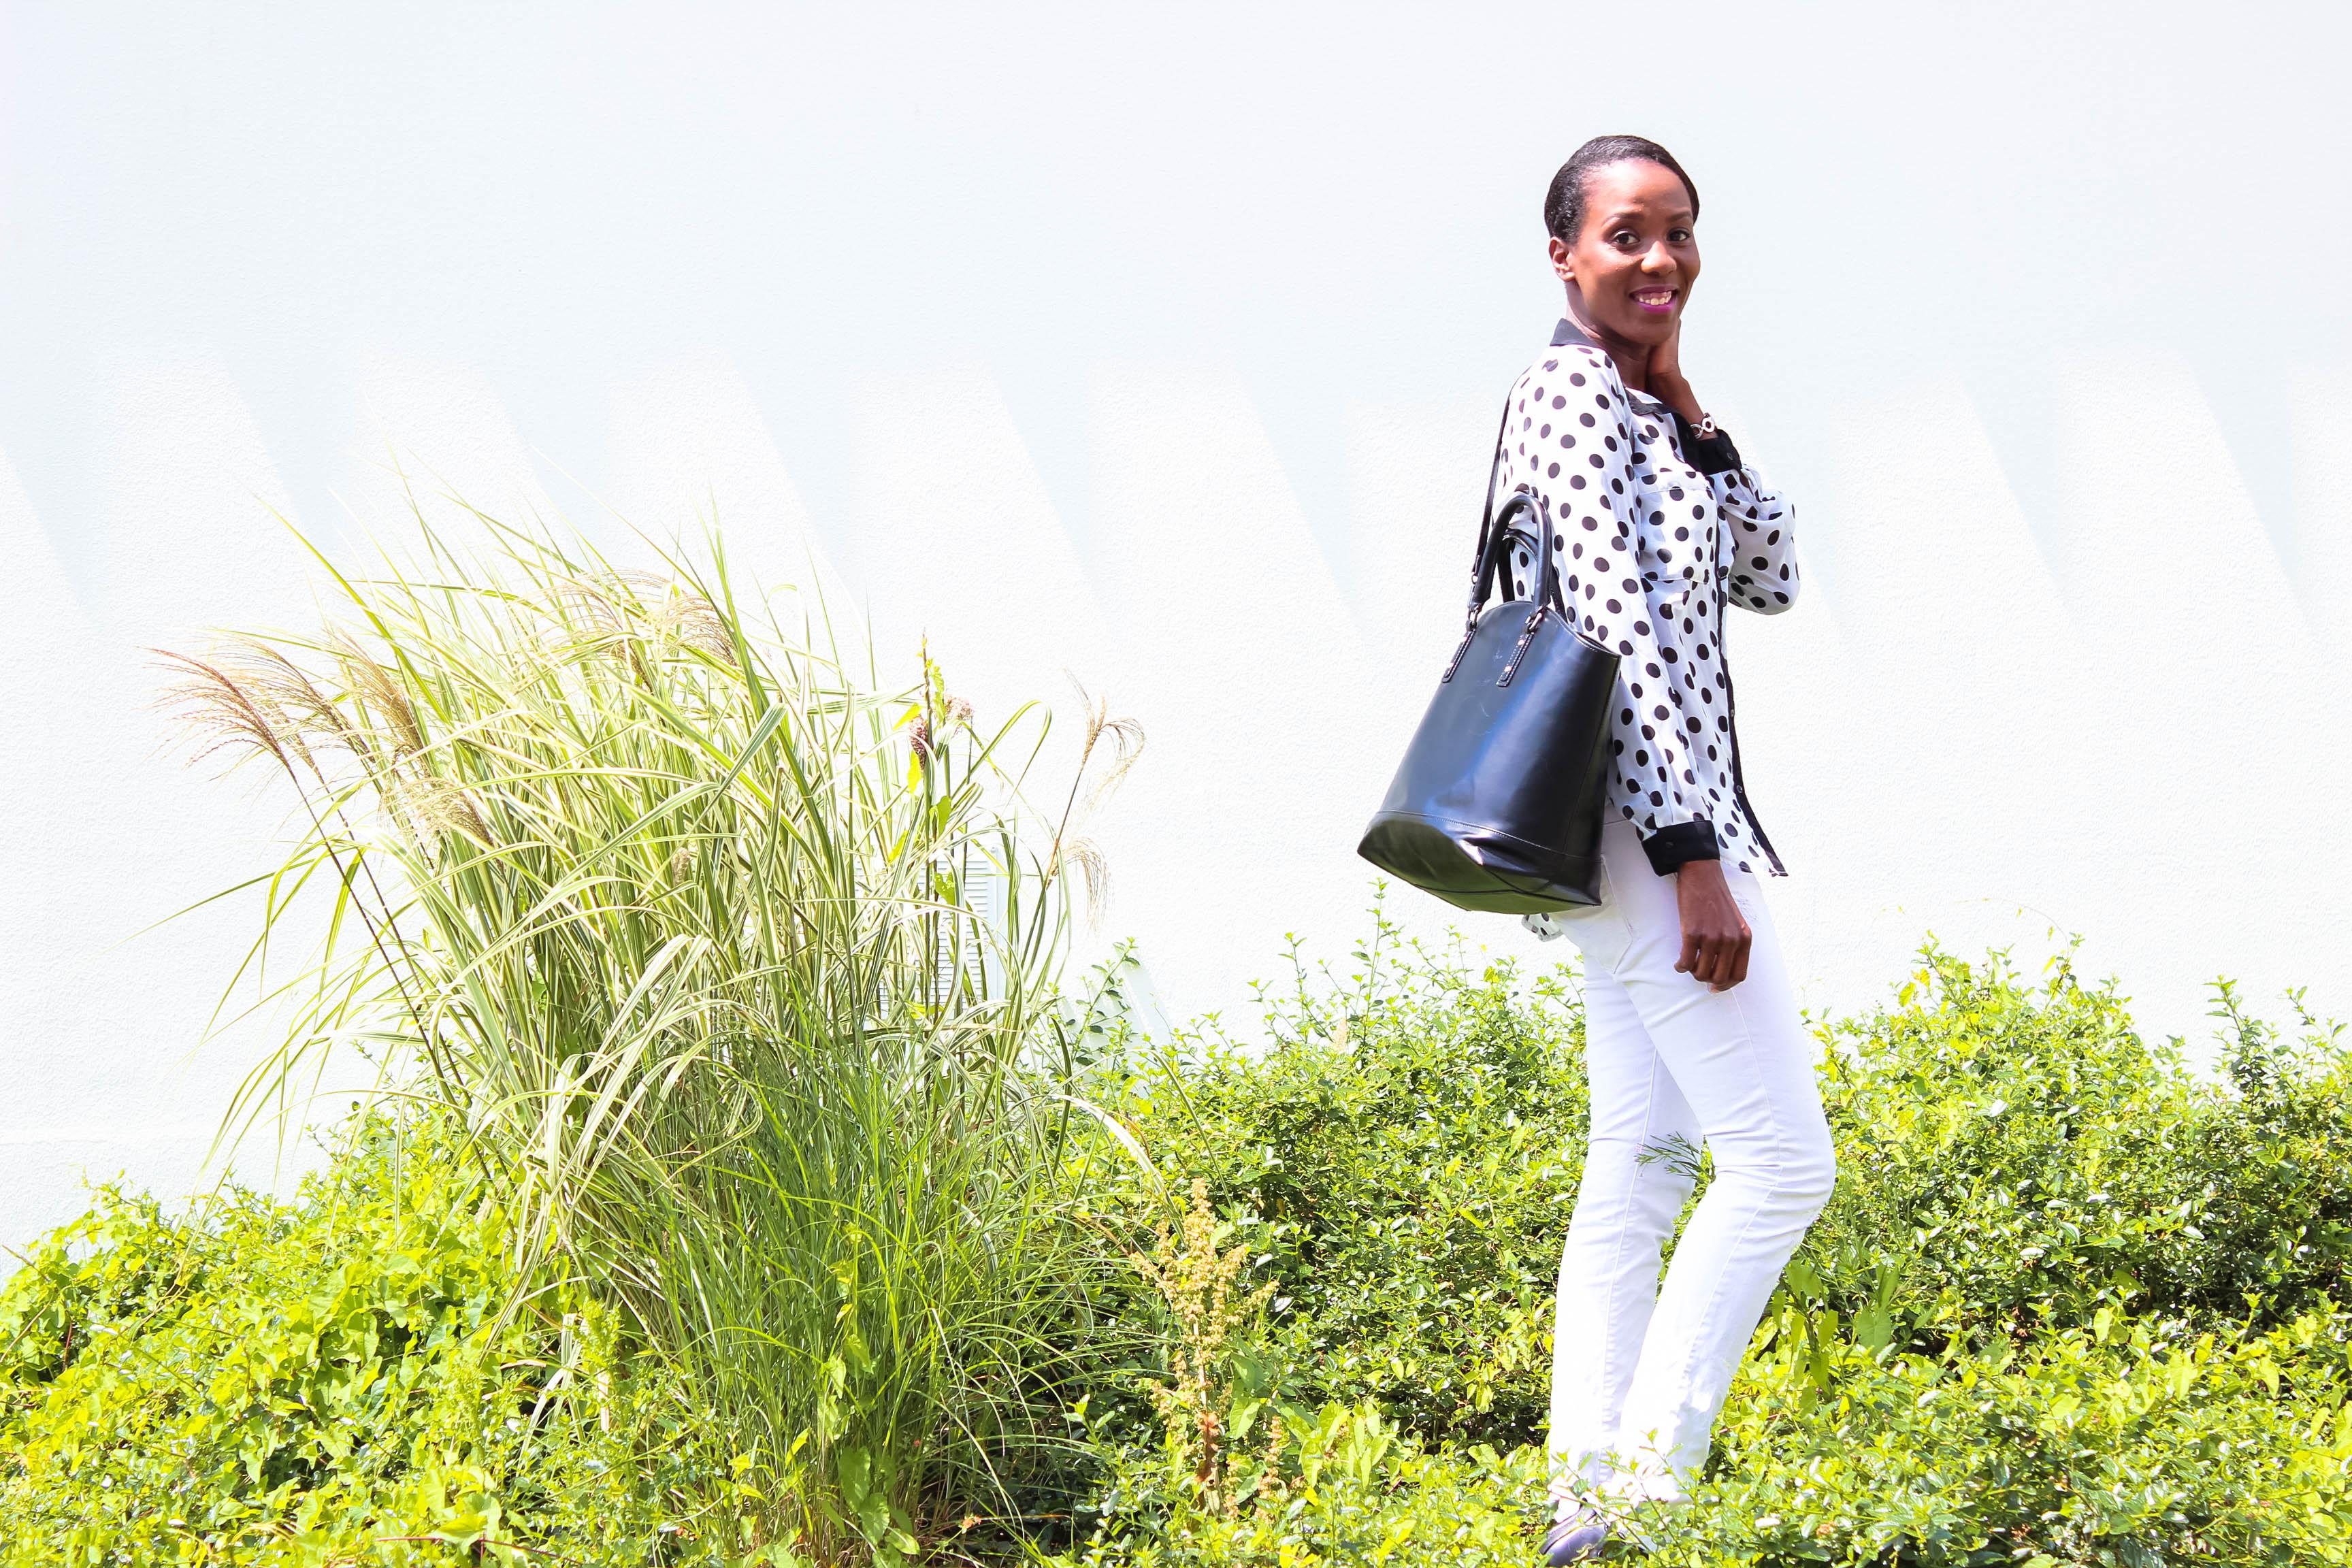 nunaavane-fashion-sunday-monochromes-zara-pimkie-bblogger-ctbb